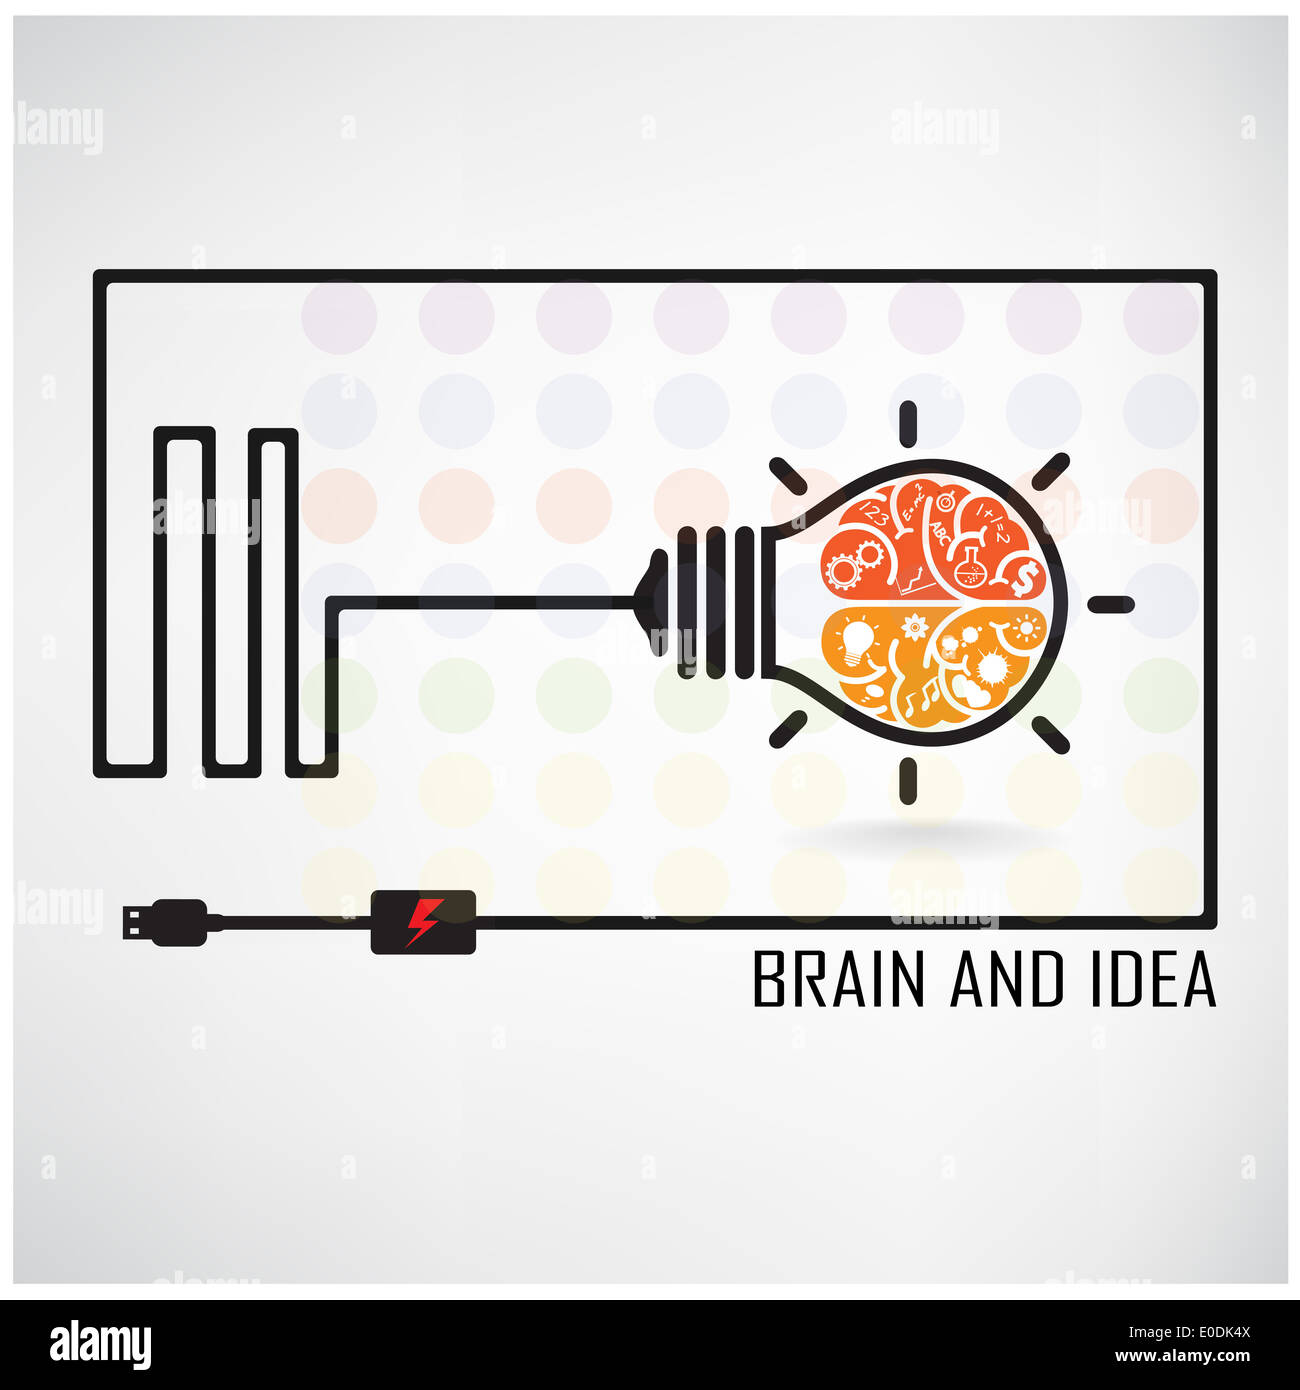 creative brain idea concept background design for poster flyer cover